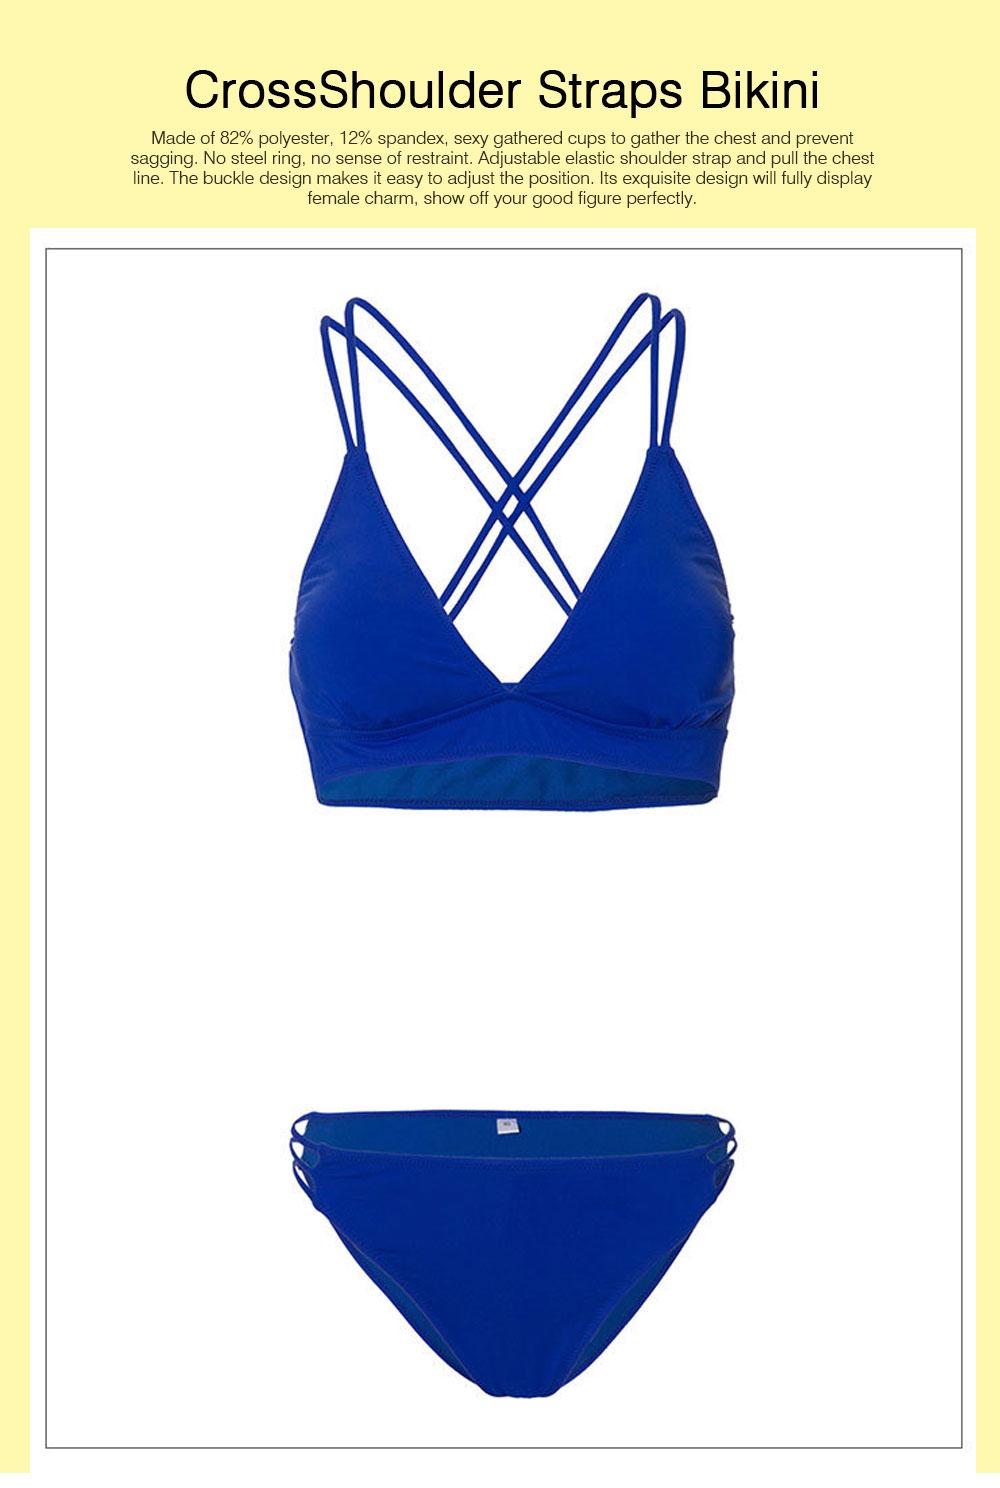 Women's Double Shoulder Straps Bikini, Cozy Ultra-Thin Sexy Triangle Cup Gathered Women's Bikini Set, No Steel Swimming Suit Bikini 0